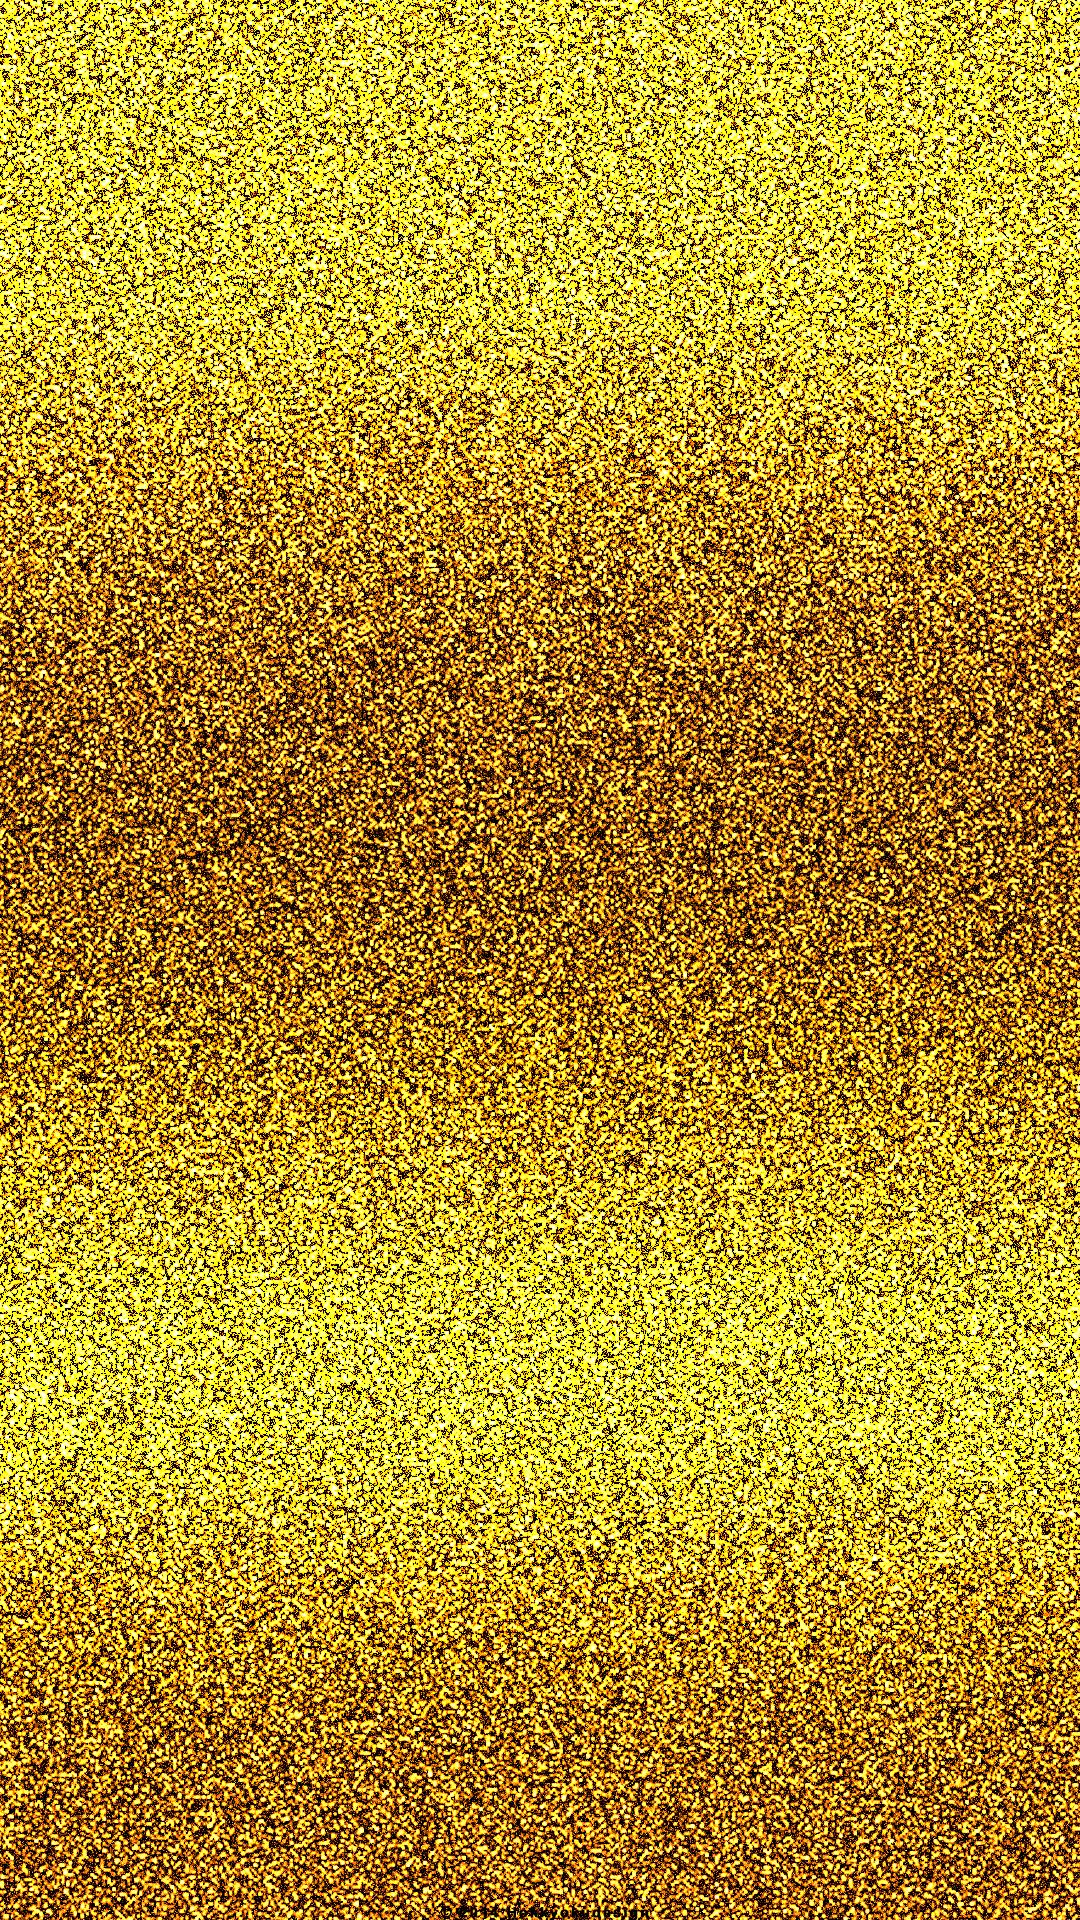 IPhone Wallpaper Gold Dust Twinkle